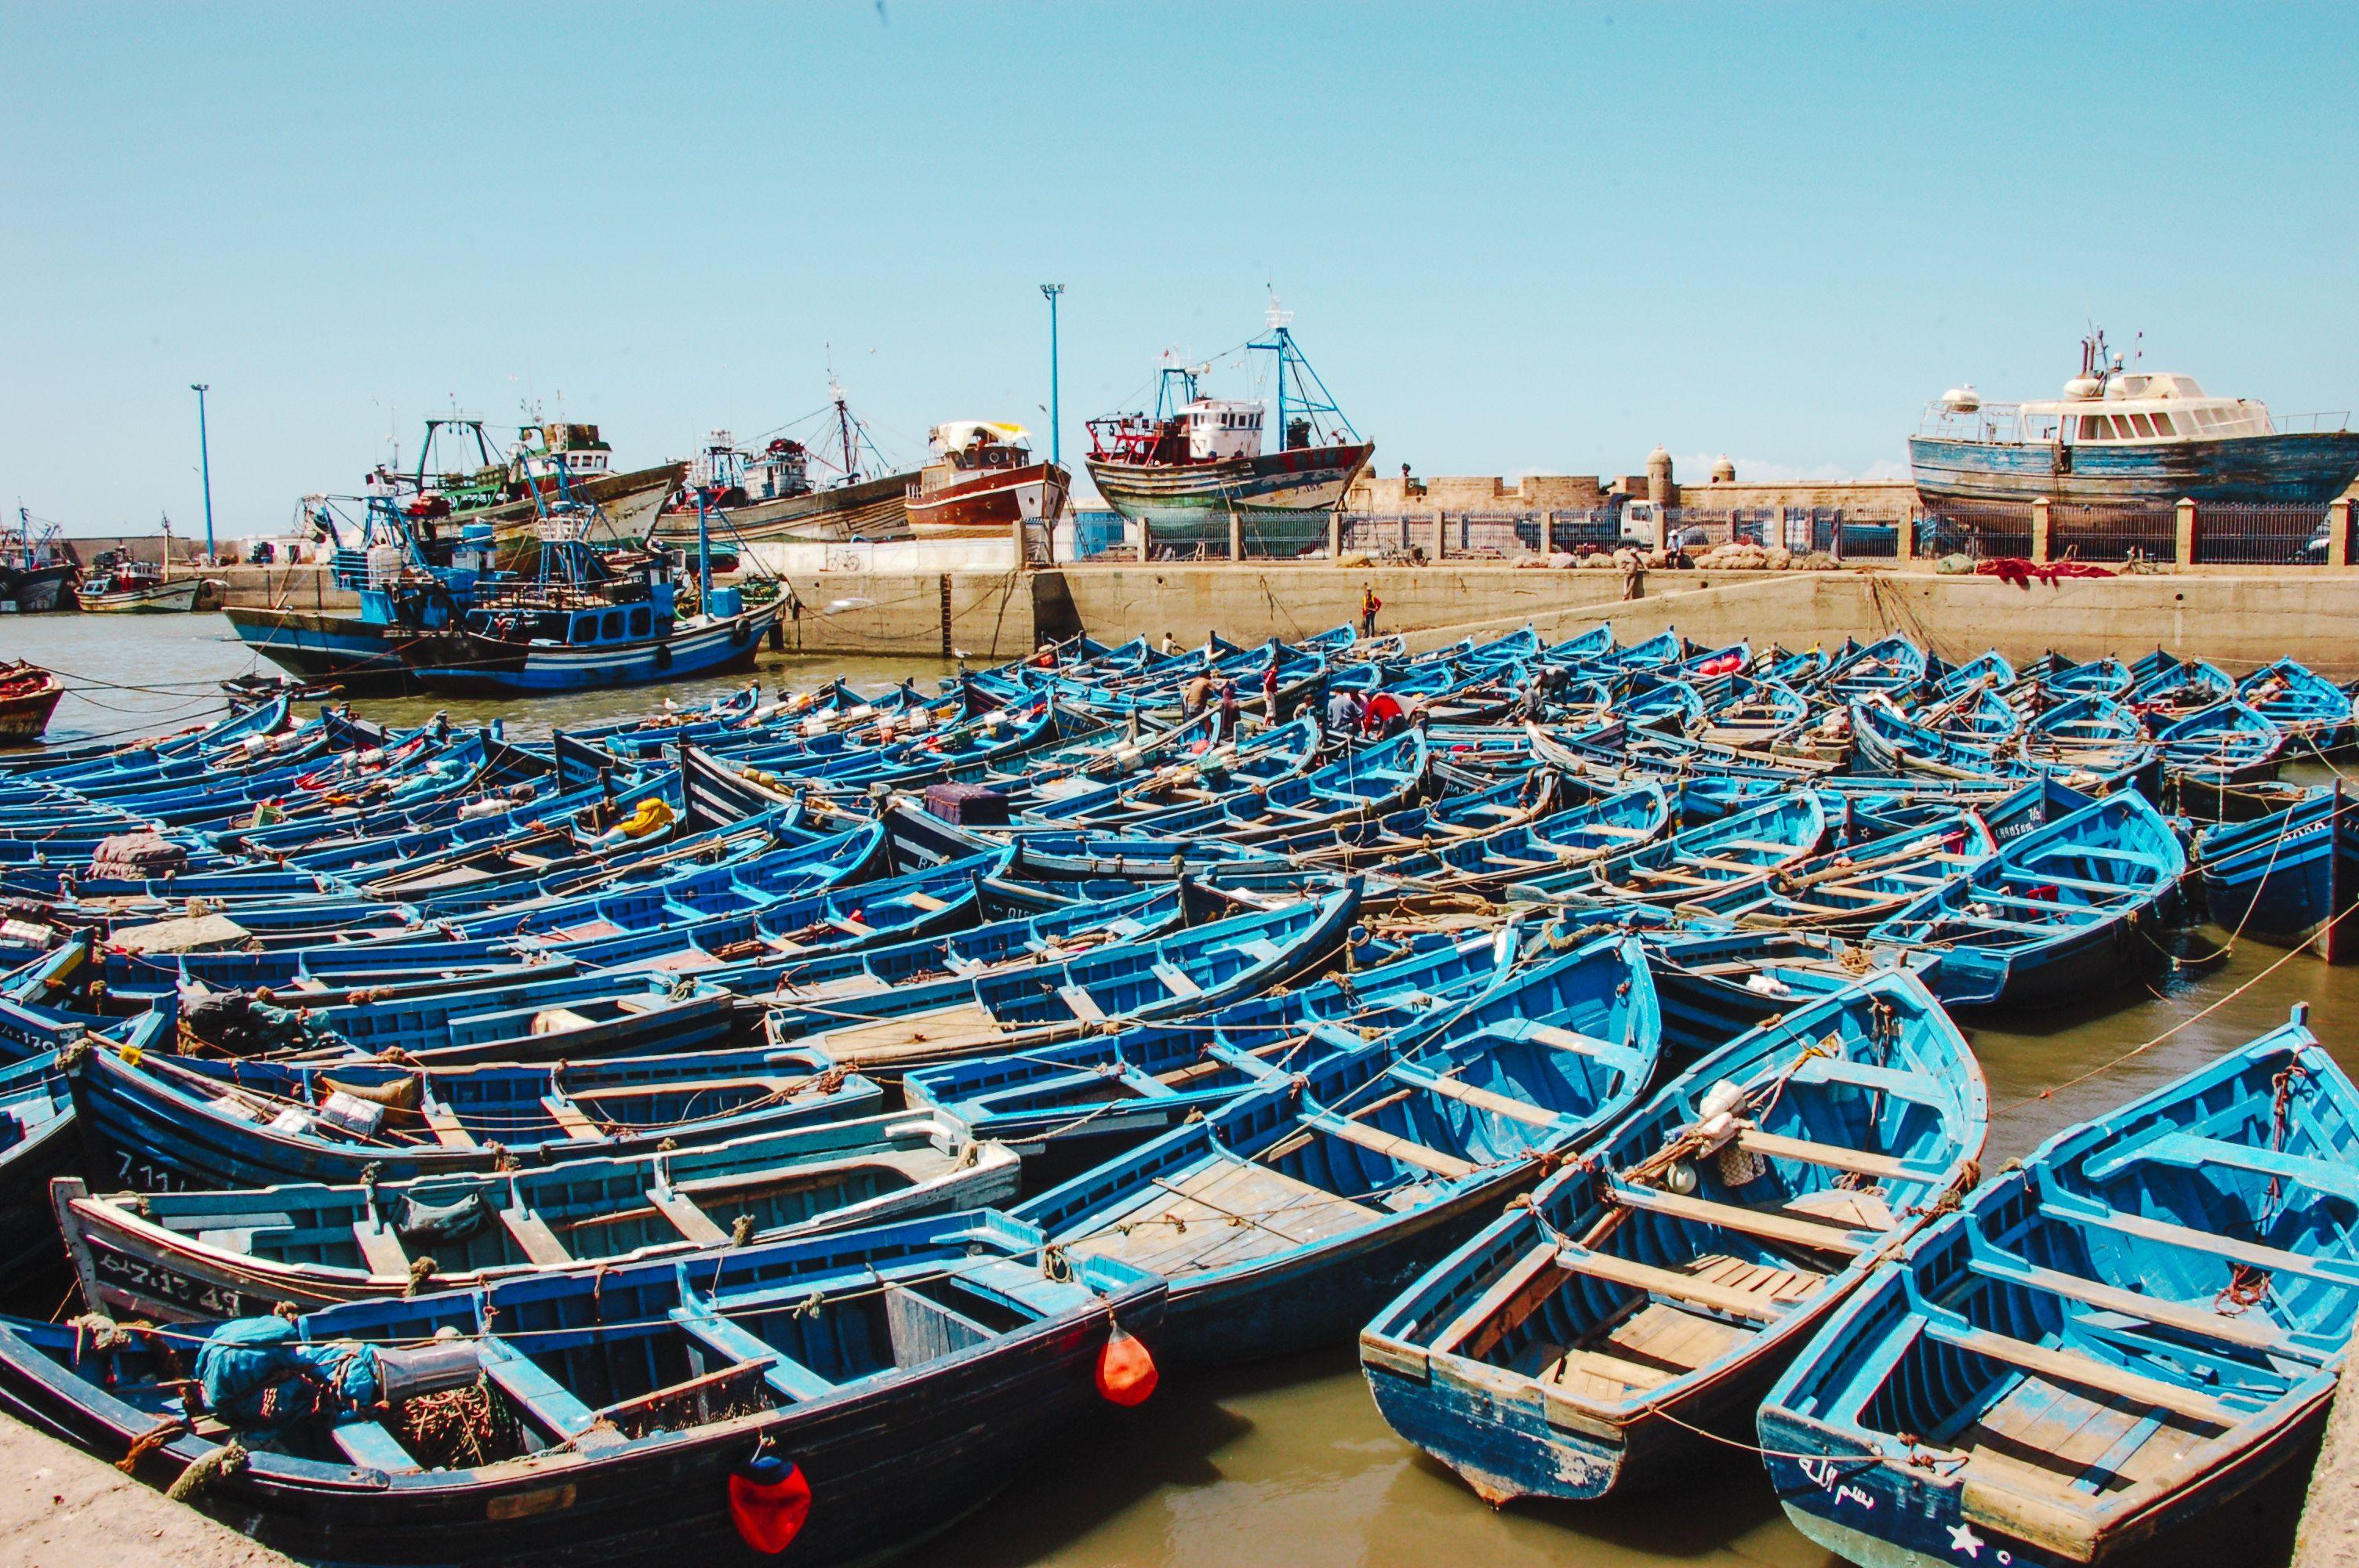 Dozens of blue boats docked in Essaouira